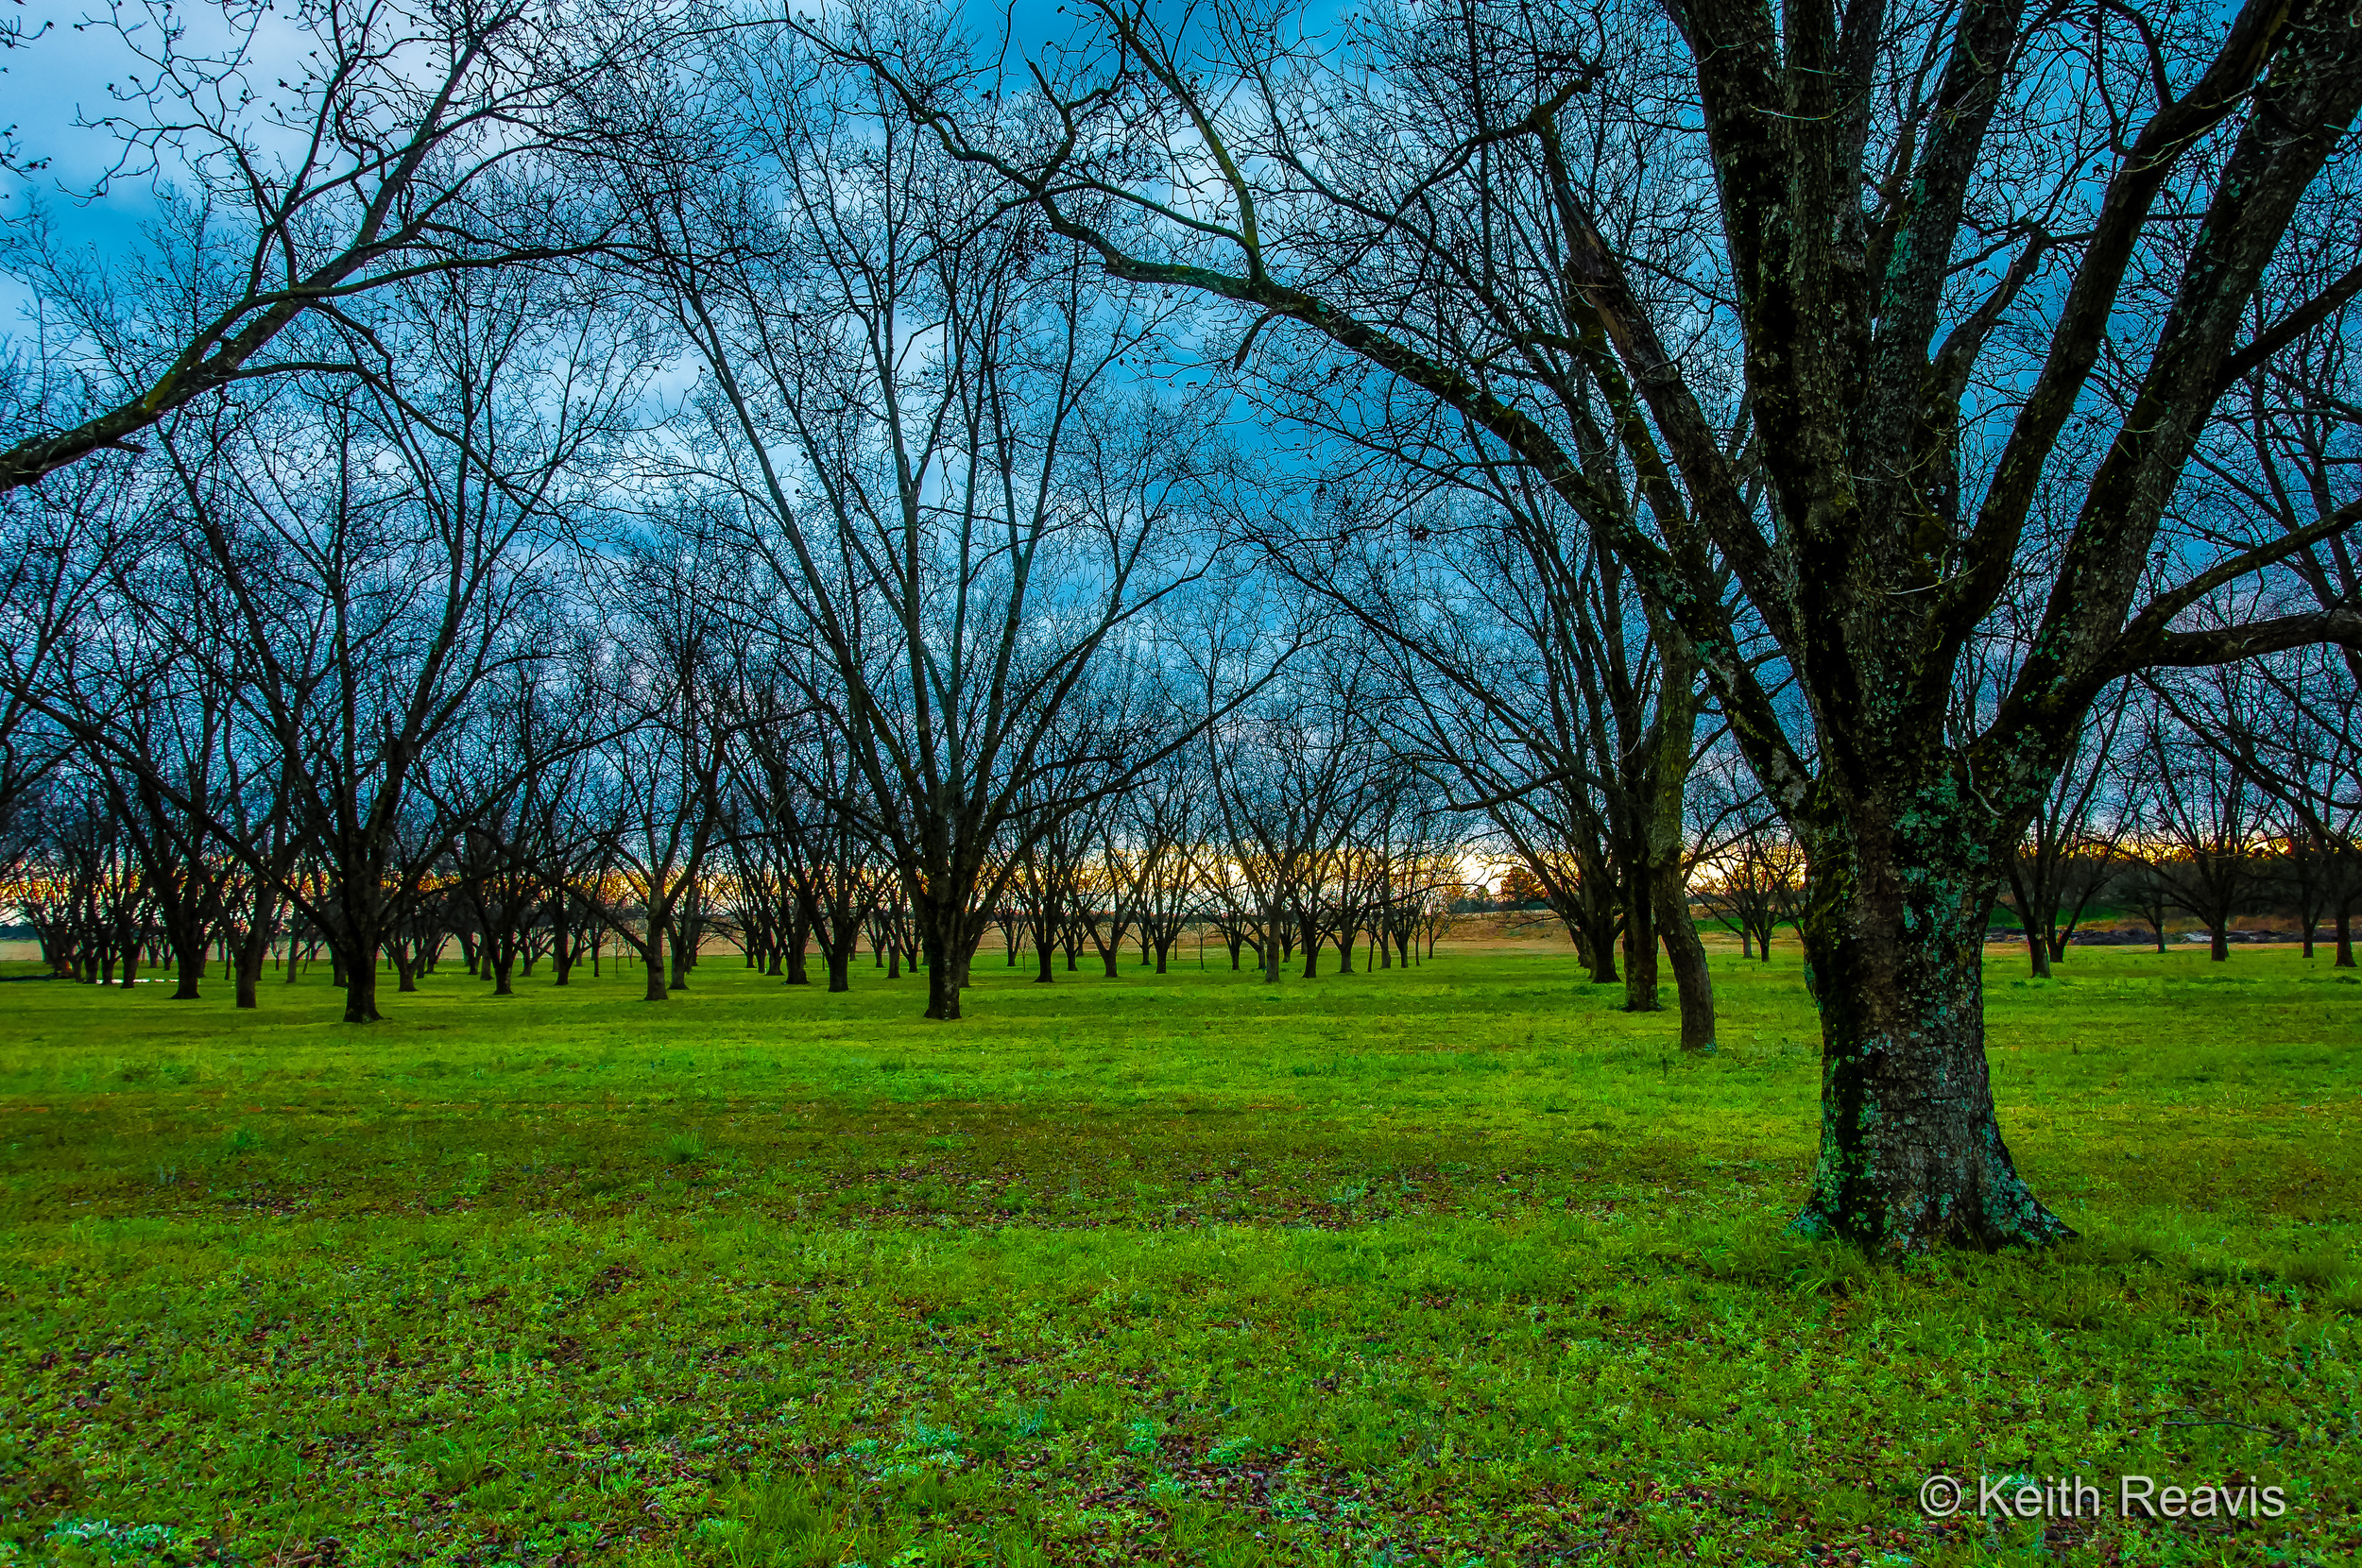 2013 Pecan Orchard GA 01_DxO-2.jpg